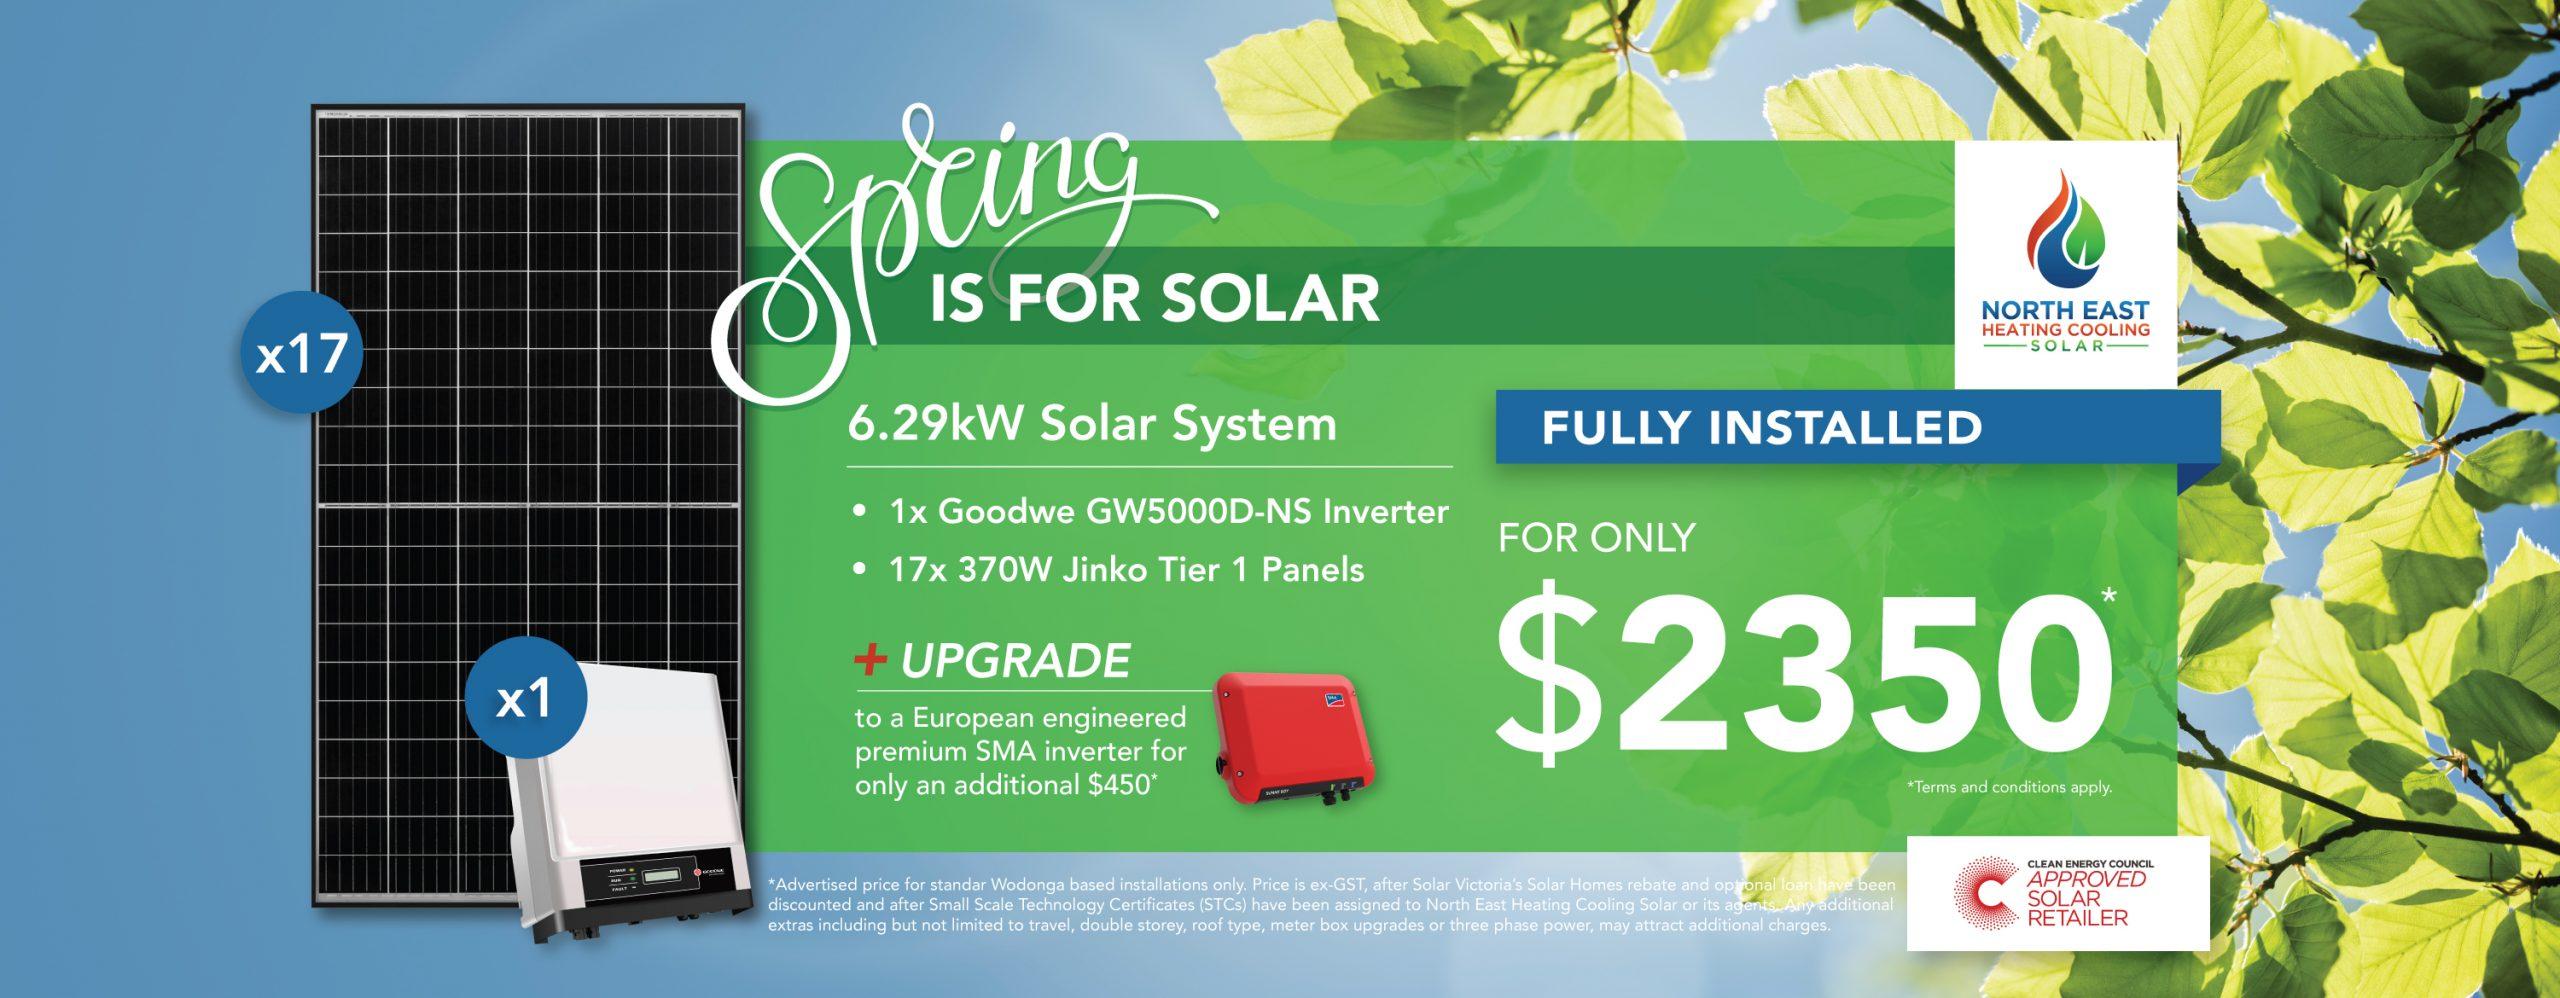 http://northeastheatcool.com.au/wp-content/uploads/2021/09/Spring-Solar-Promo-21_NEBanner_NEW-scaled.jpg